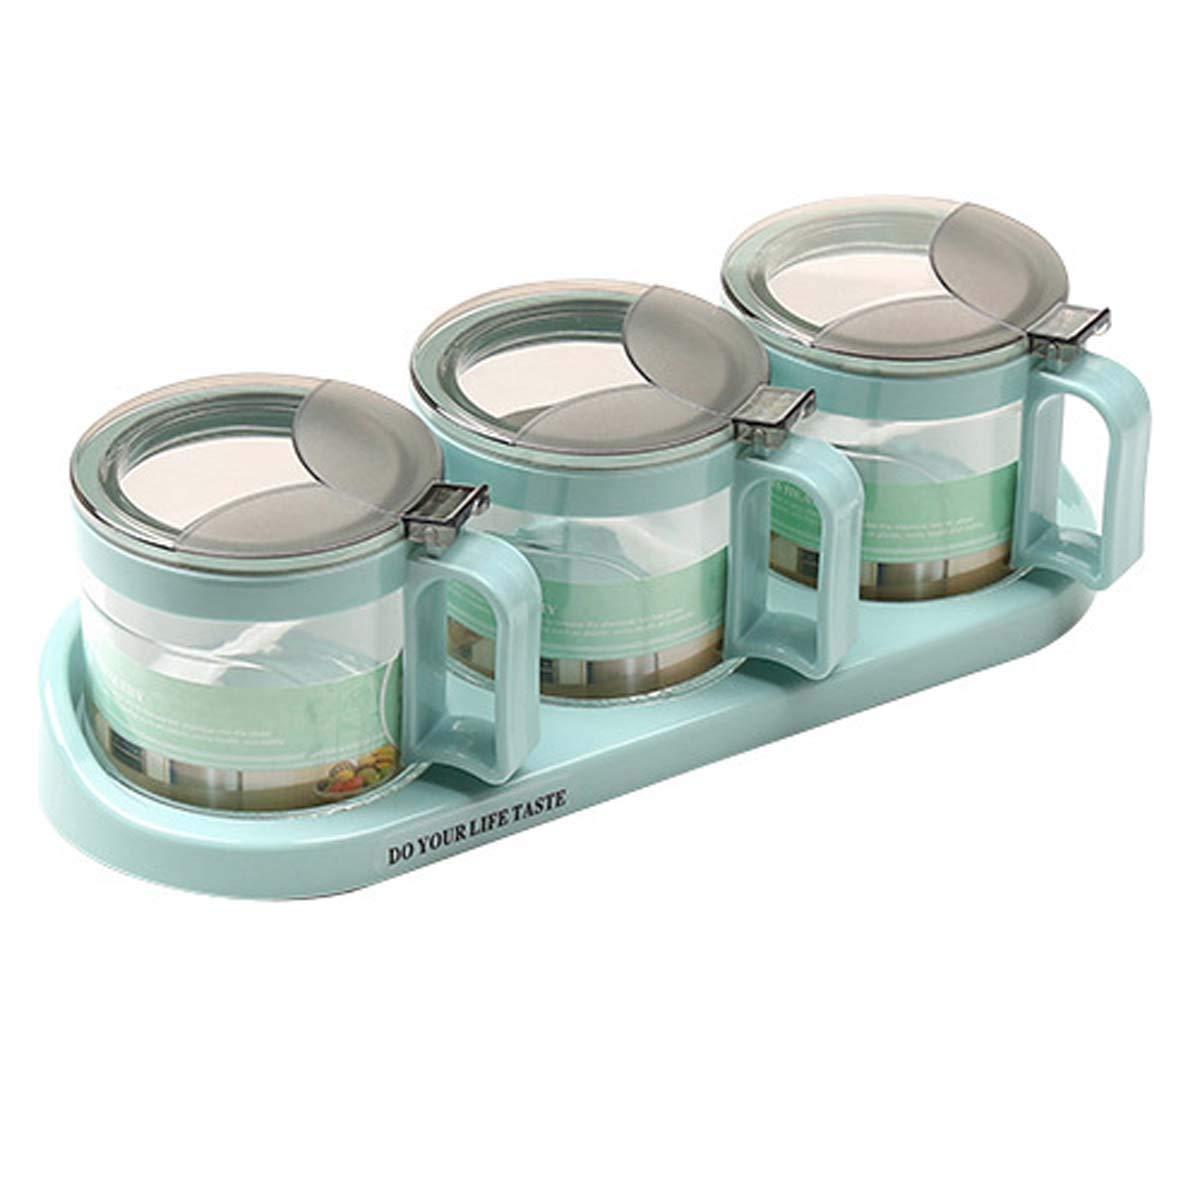 Cheap Hot Pot Seasoning, find Hot Pot Seasoning deals on line at ...